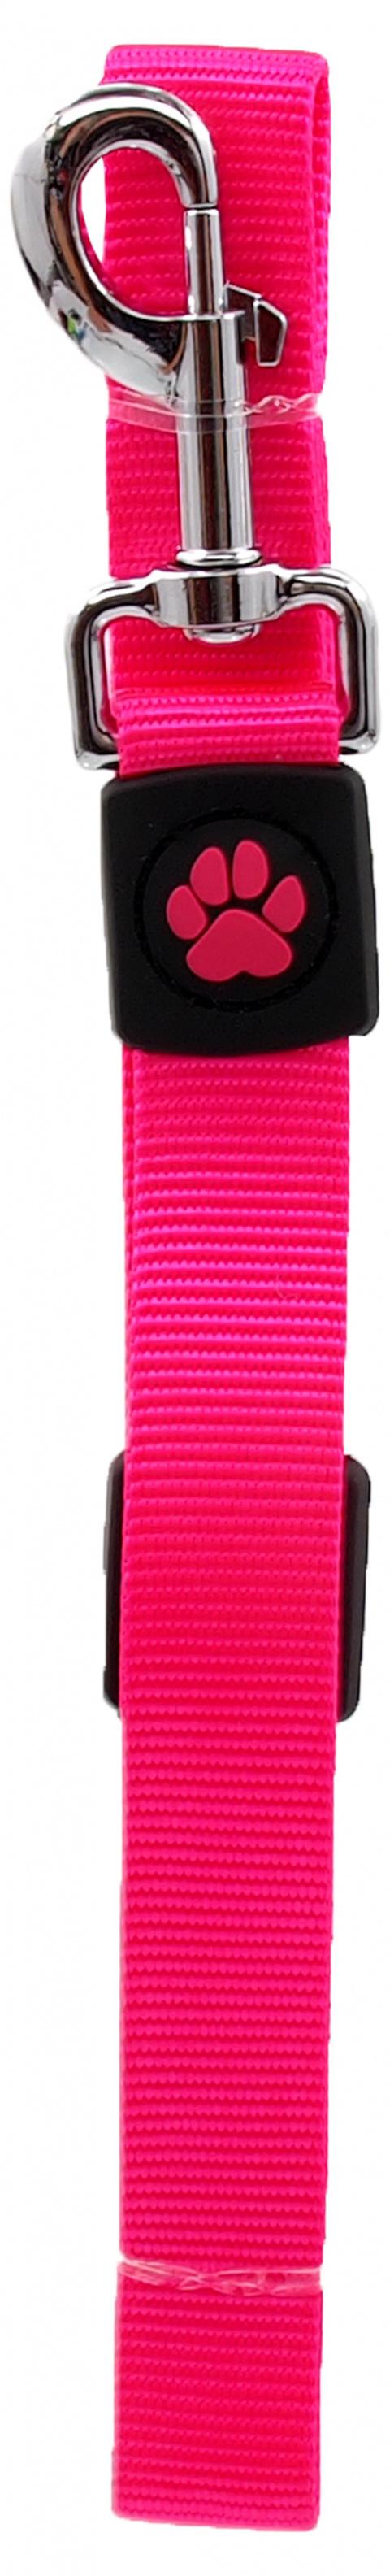 Vodítko Active Dog Premium L růžové 2,5x120cm